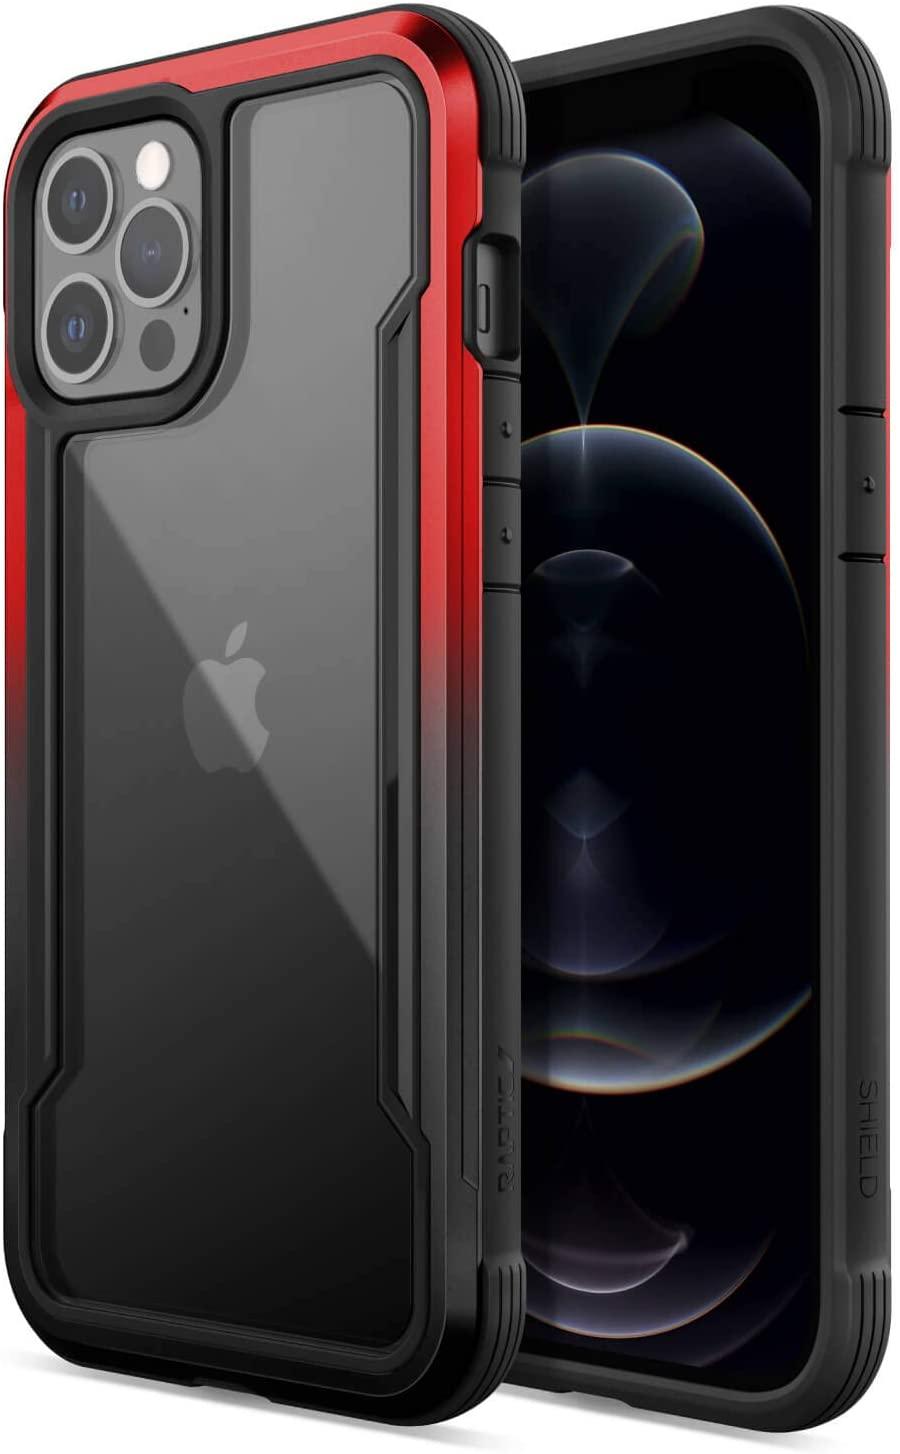 Raptic Shield Etui Aluminiowe do iPhone 12 Pro Max (Drop Test 3m) (Black & Red Gradient)